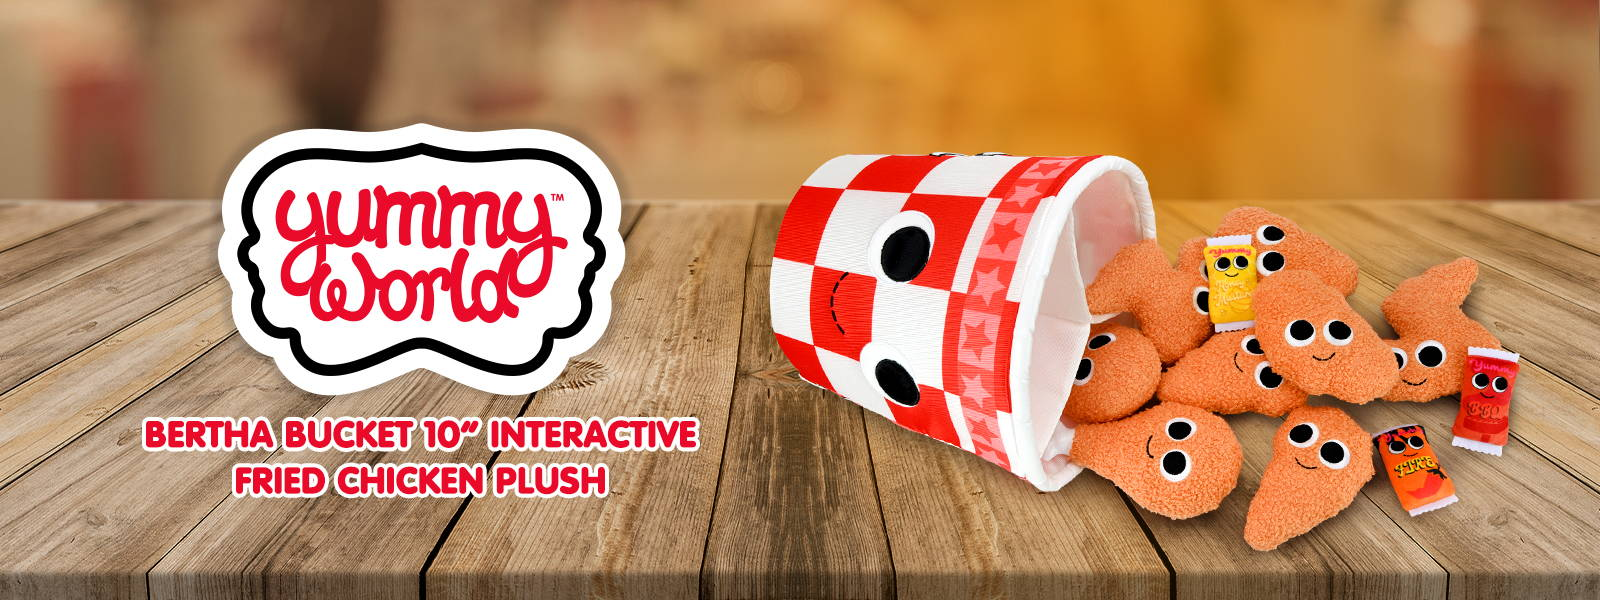 Yummy World Bertha Bucket of Fried Chicken Interactive Plush